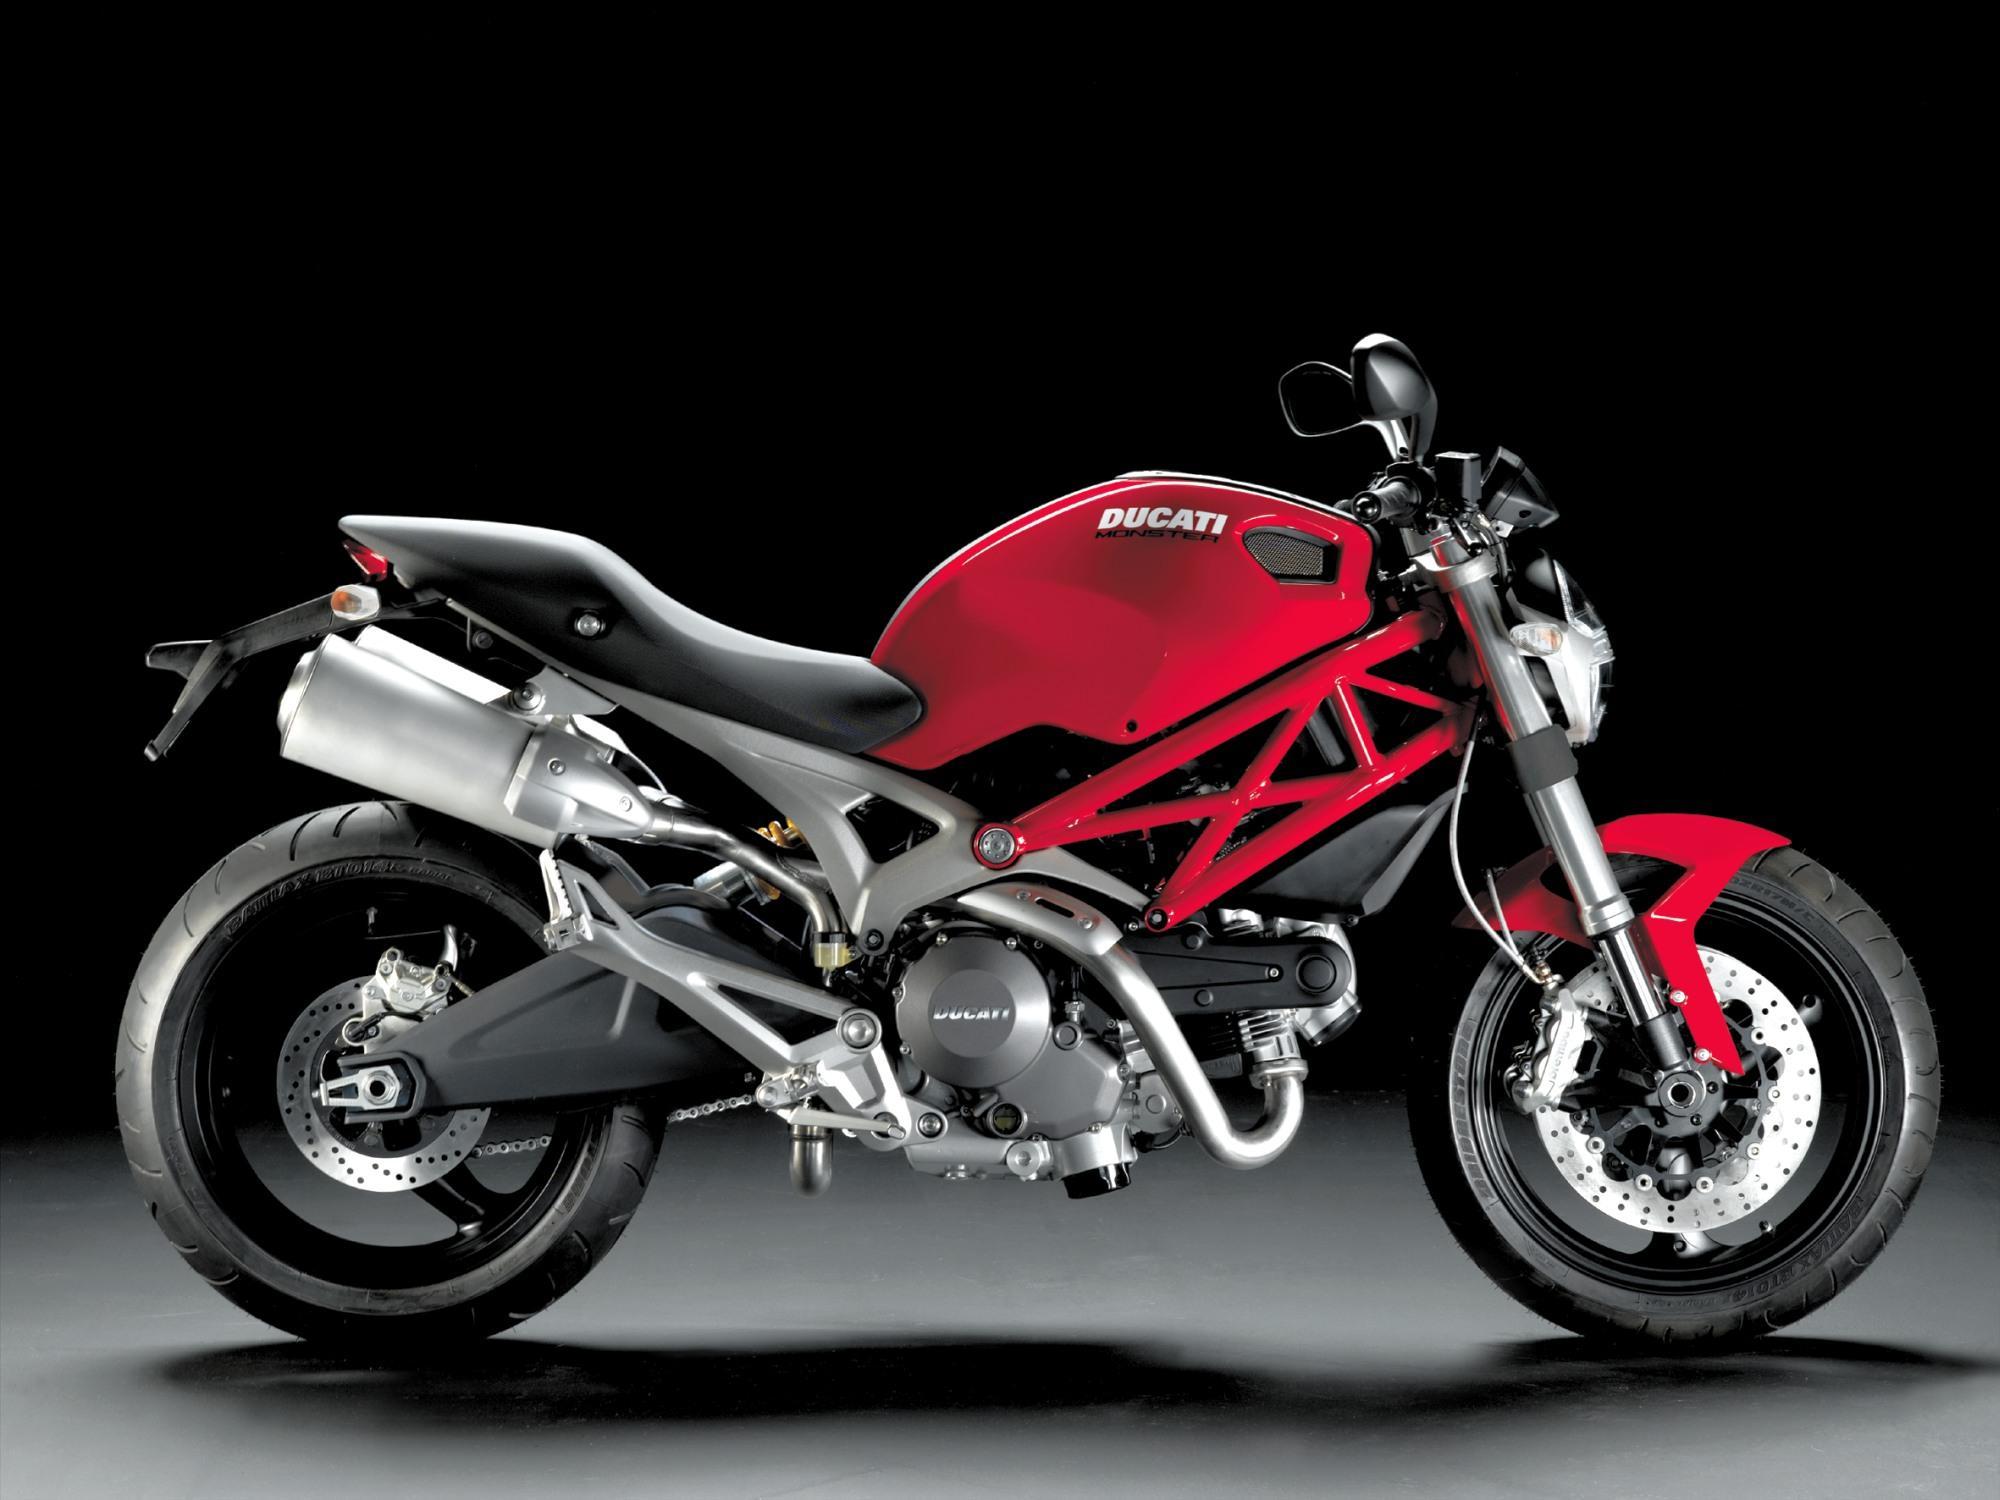 Ducati Monster Geschichte Motorrad Fotos Amp Motorrad Bilder